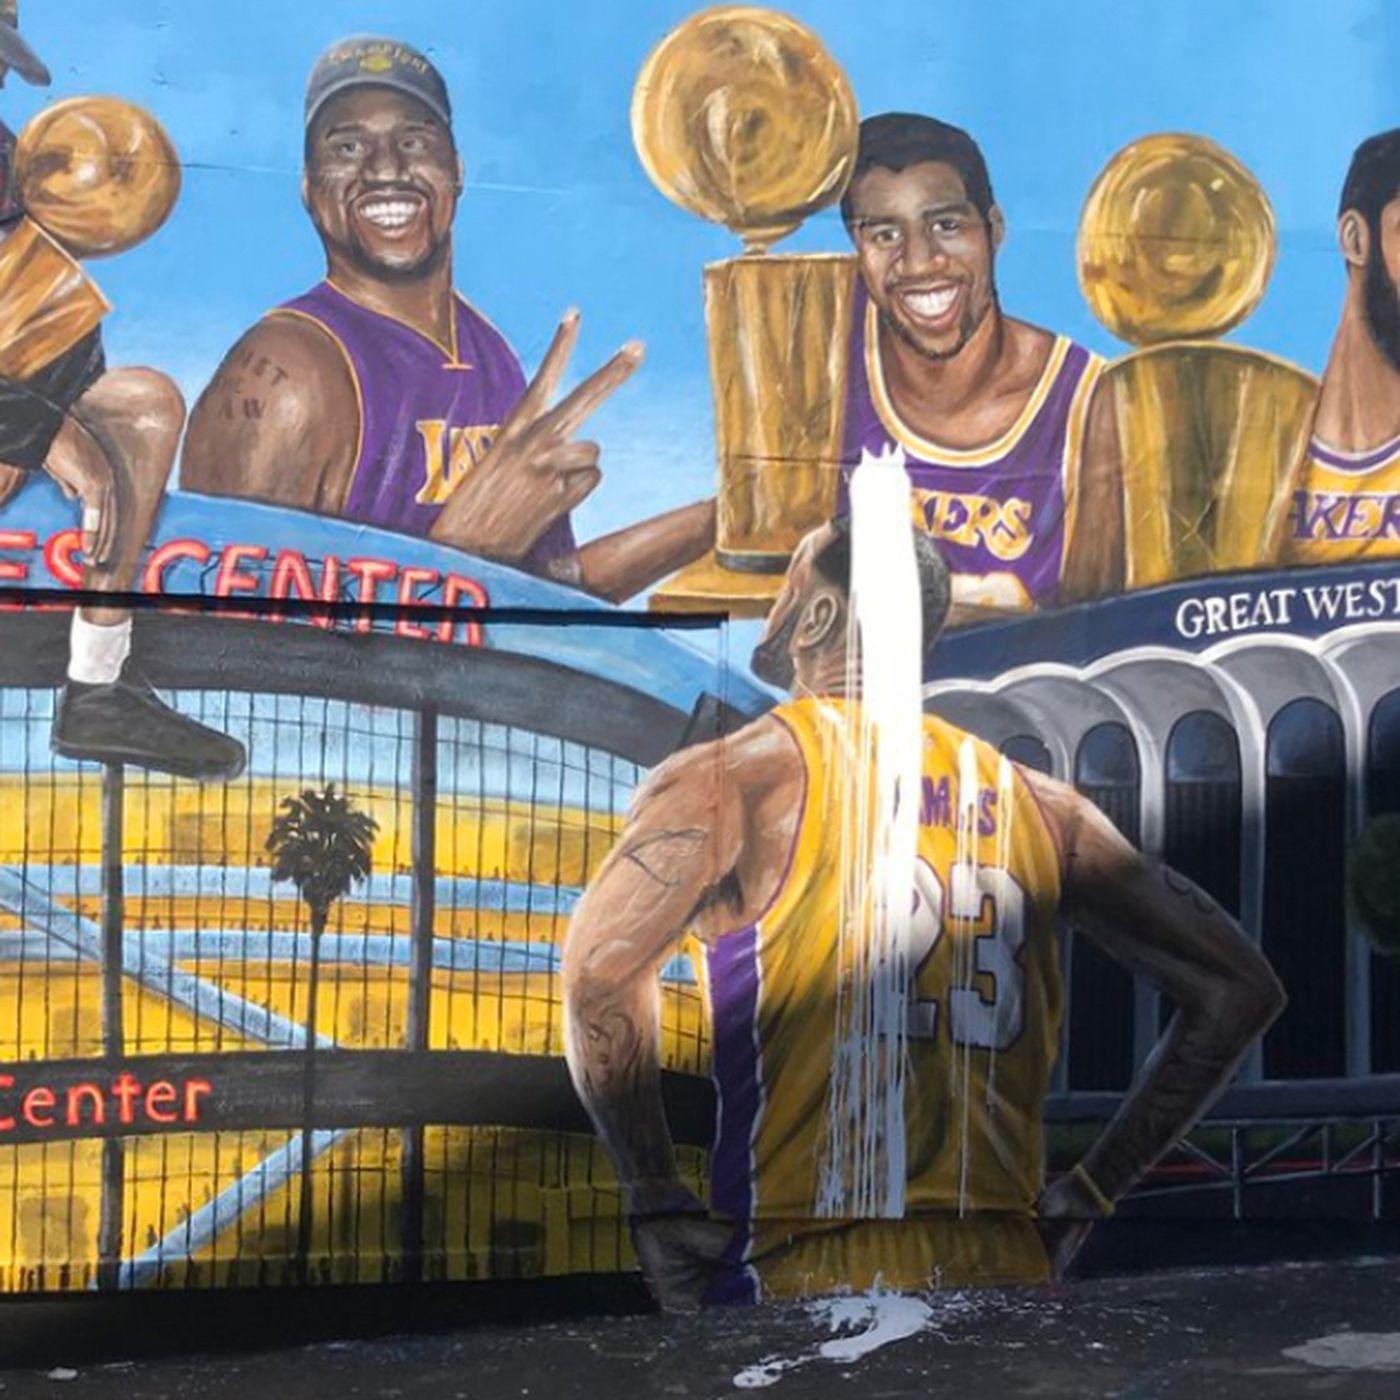 d855b77d86c8 LeBron James Lakers murals keep getting vandalized in L.A. - SBNation.com